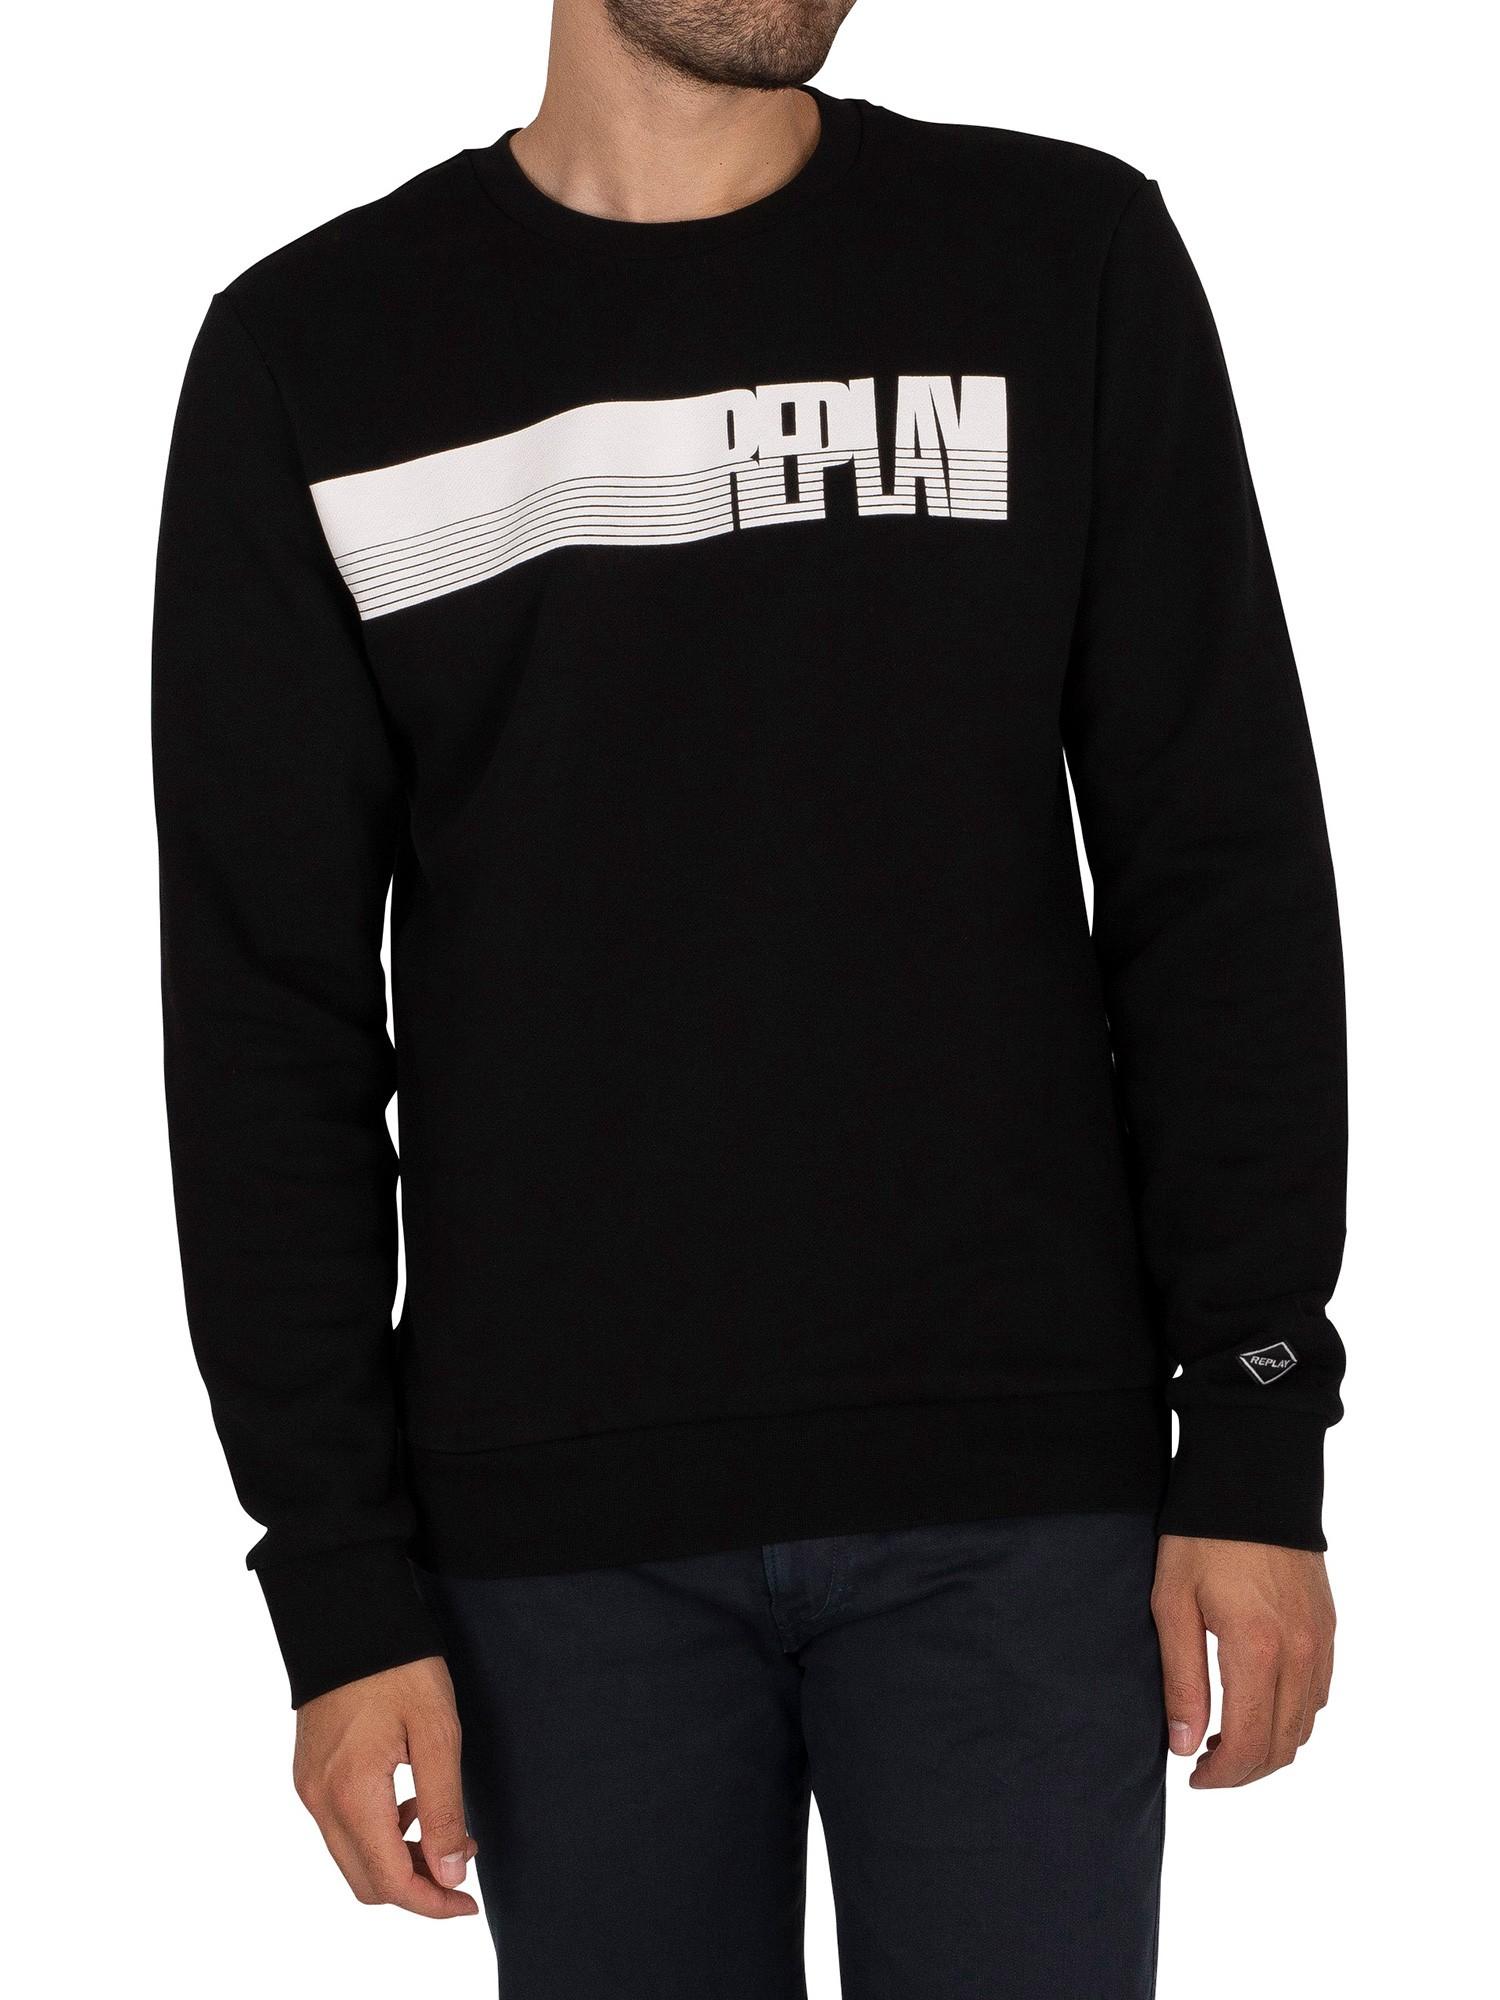 Clothing Graphic Sweatshirt